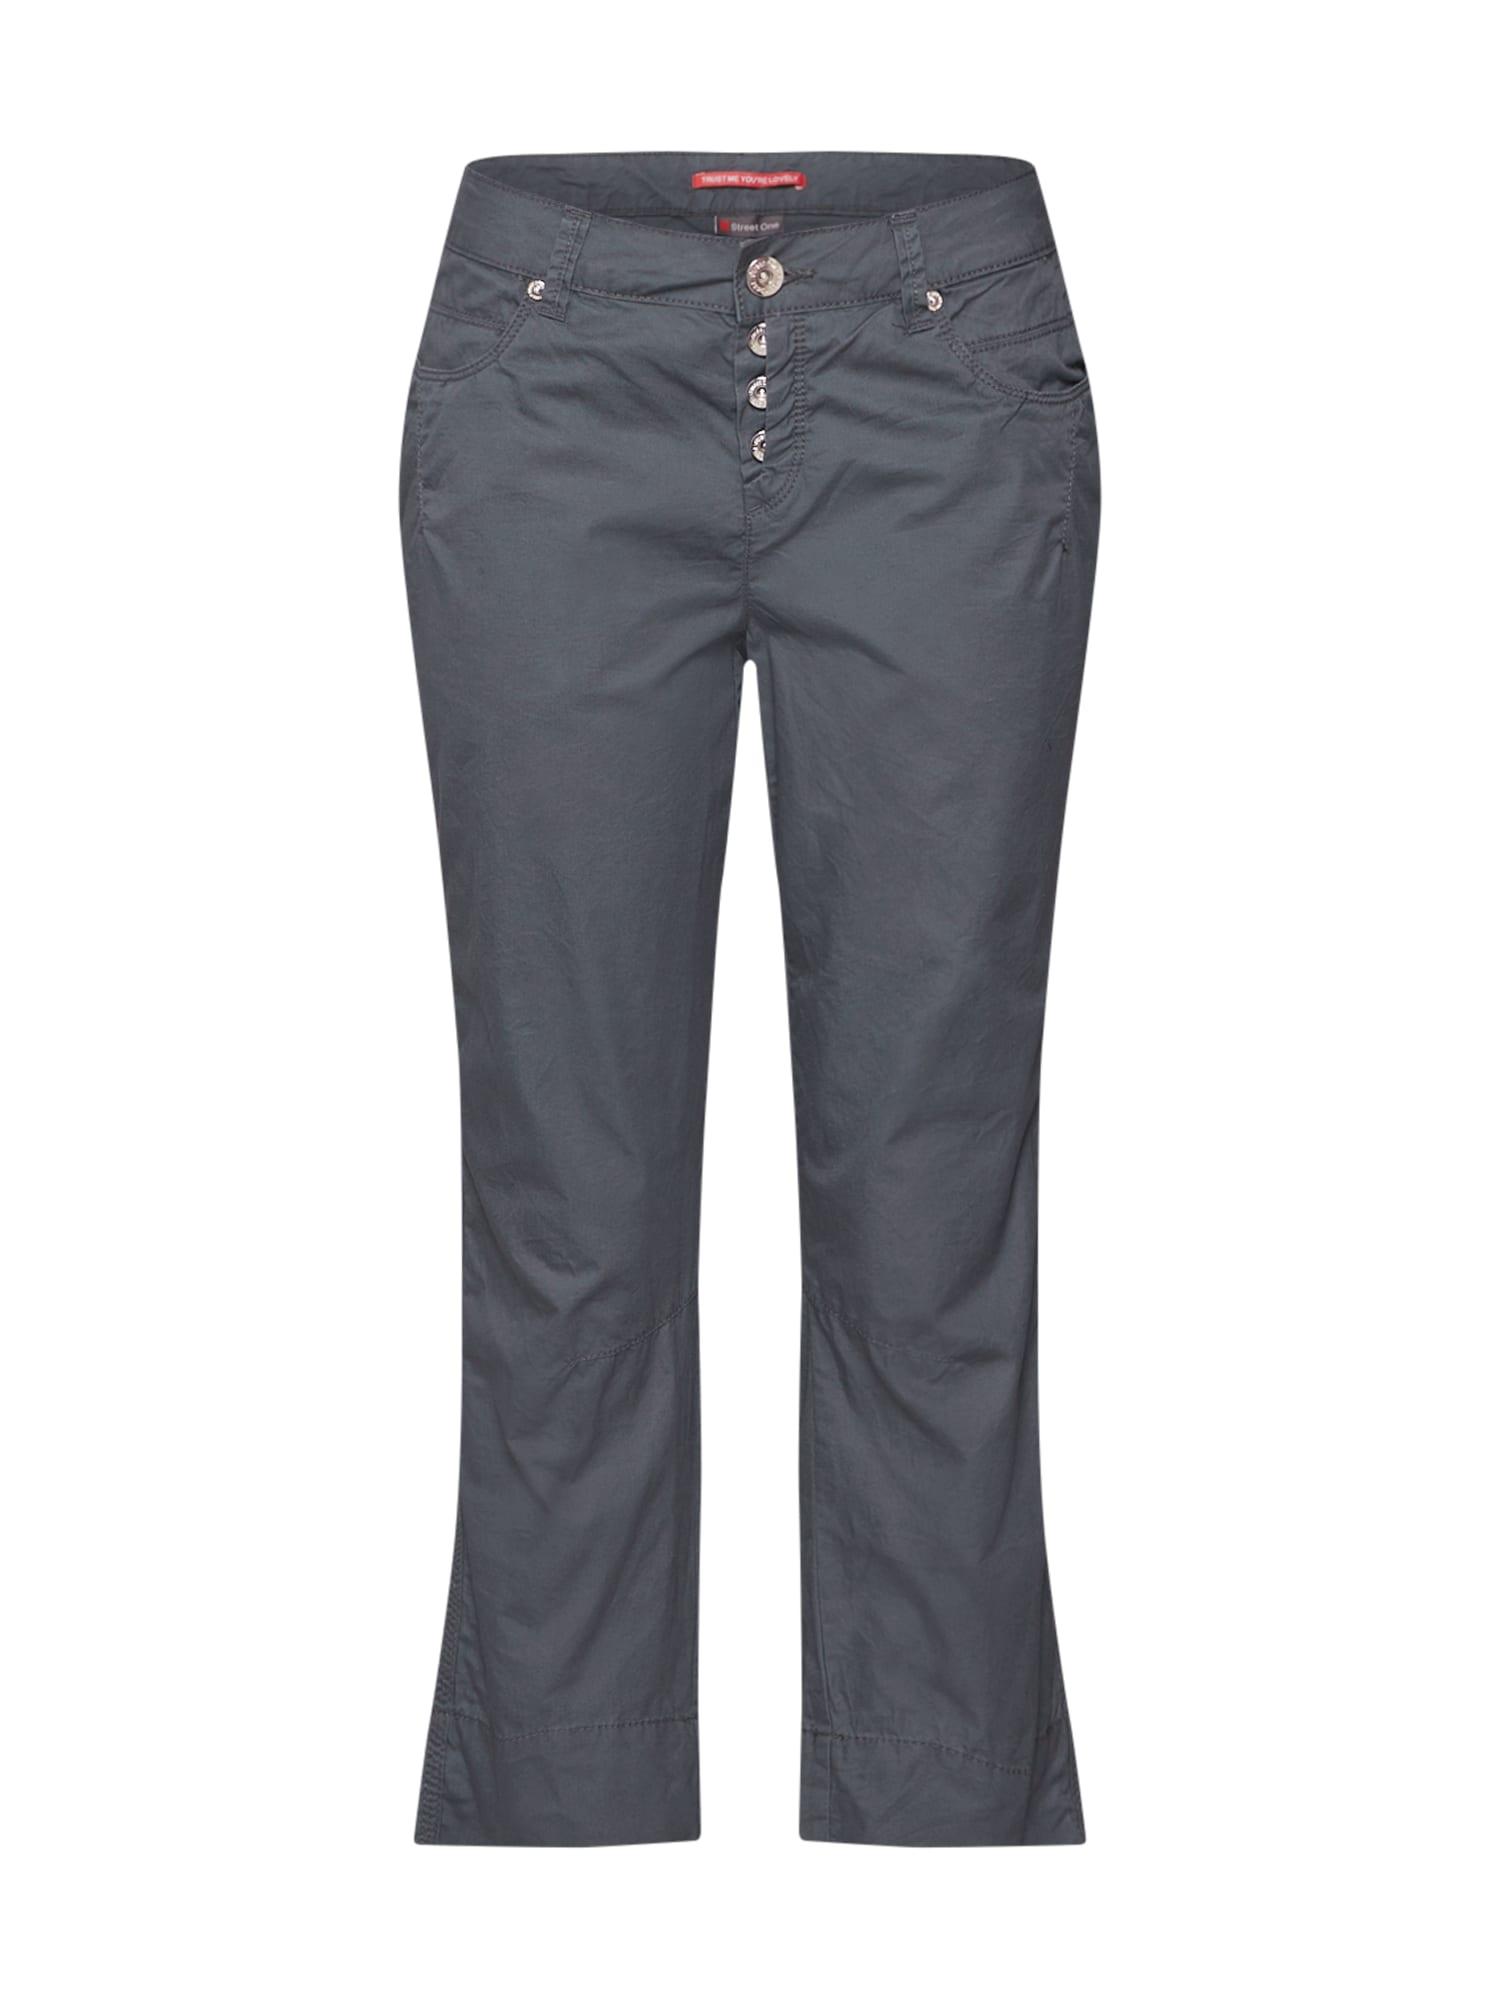 Chino kalhoty Jane L26 Papertouch MW Casual tmavě zelená STREET ONE